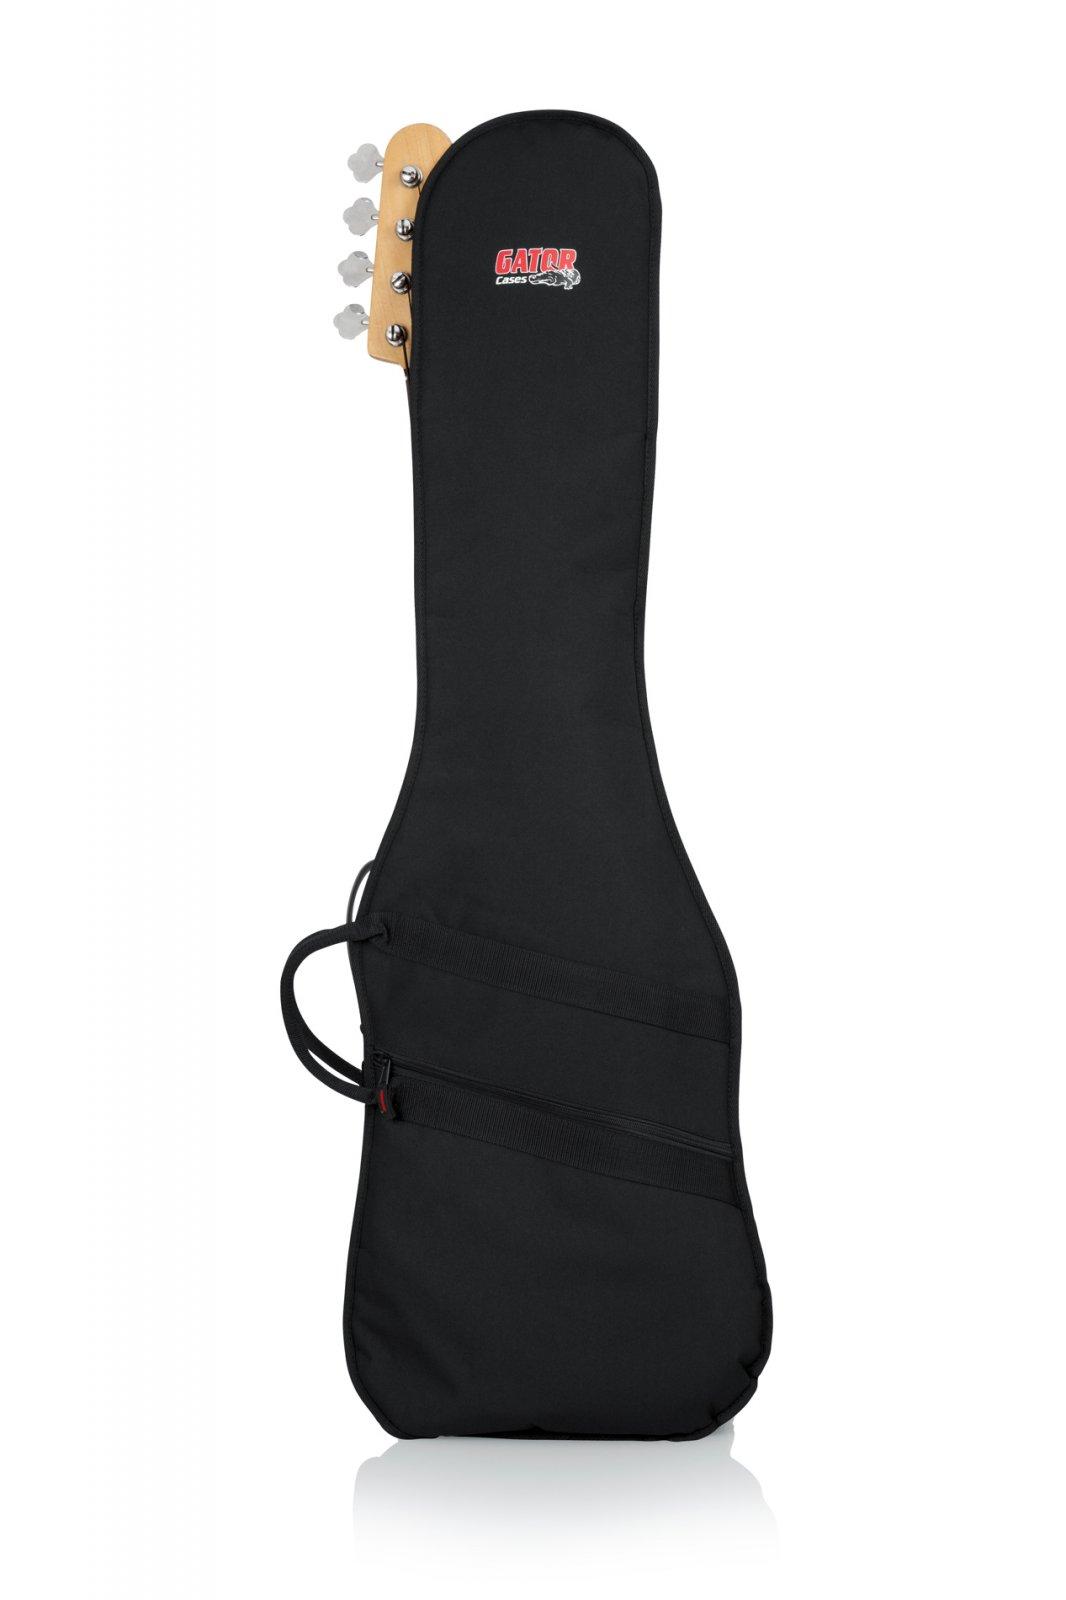 GATOR GBE Bass Guitar Gig Bag